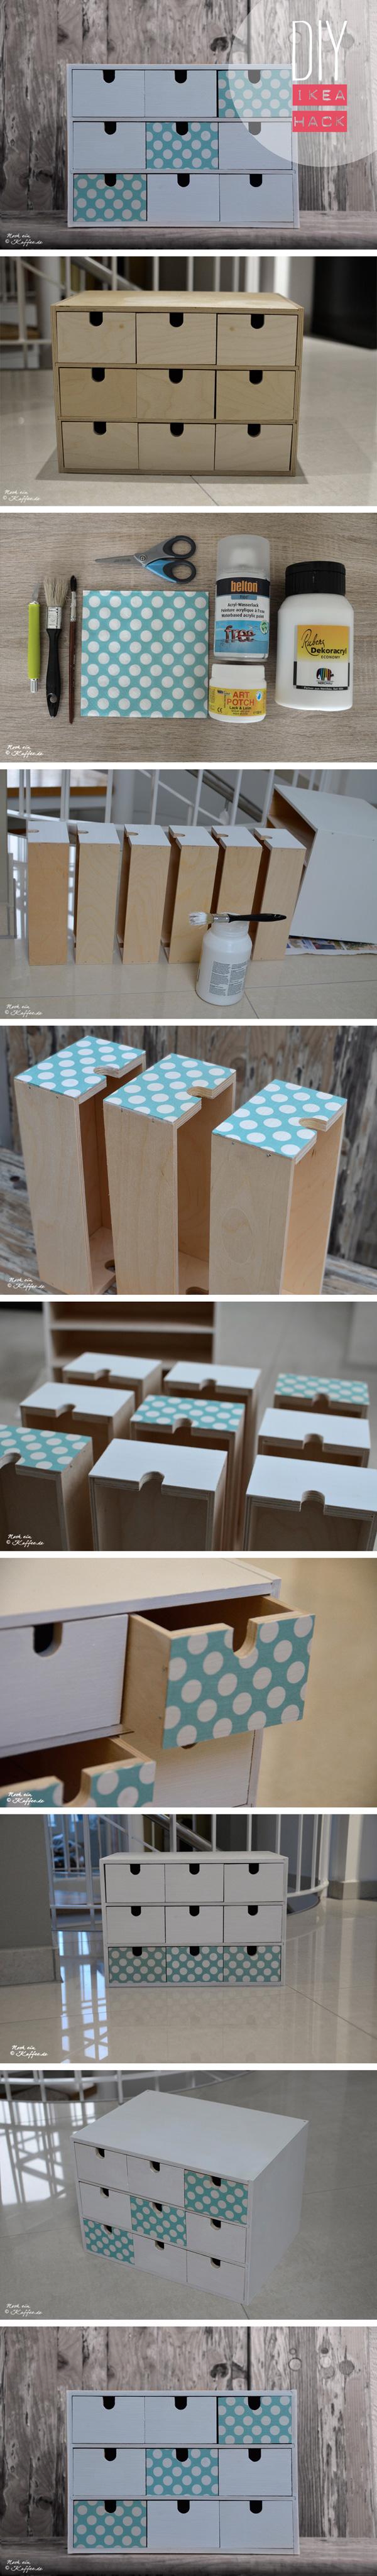 LoveAndLilies.de|DIY Ikea Hack Fira Minikommode